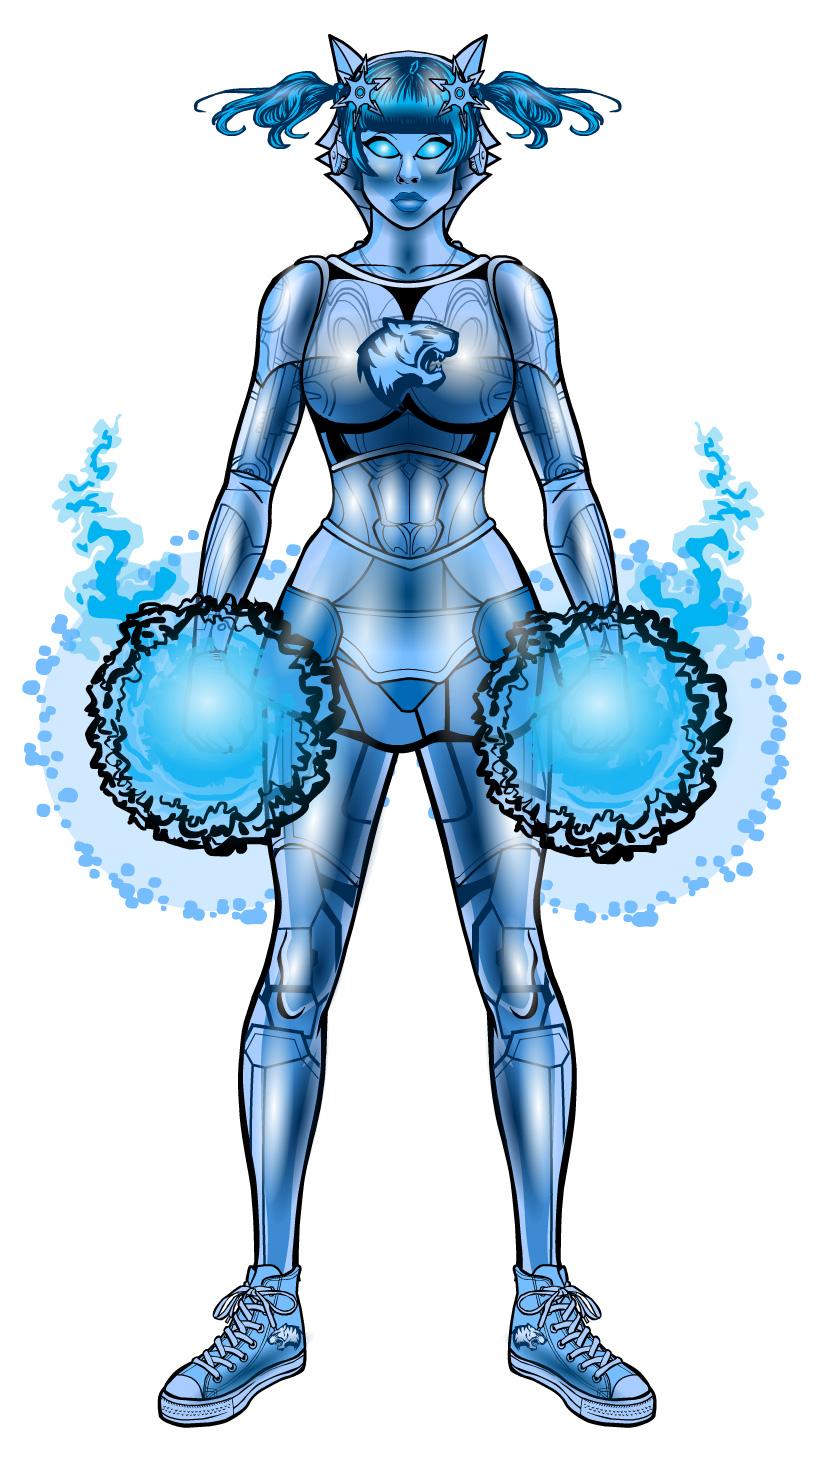 http://www.heromachine.com/wp-content/legacy/forum-image-uploads/dblade/2012/05/dblade_WildcatCheerleader-1.jpg